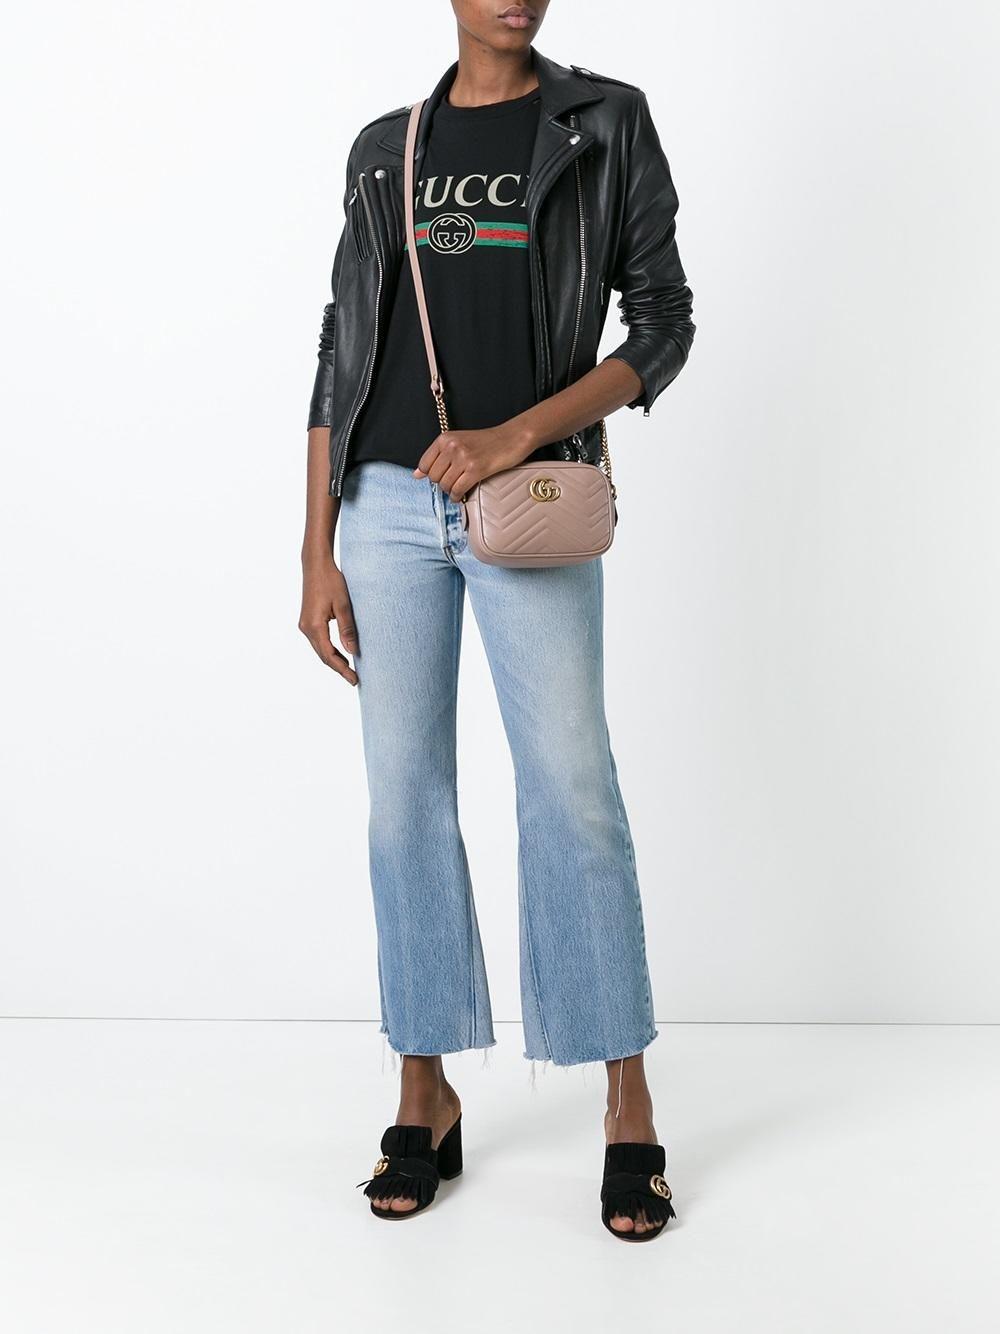 405255c83faa Gucci GG Marmont crossbody bag | Purses in 2019 | Gucci crossbody ...